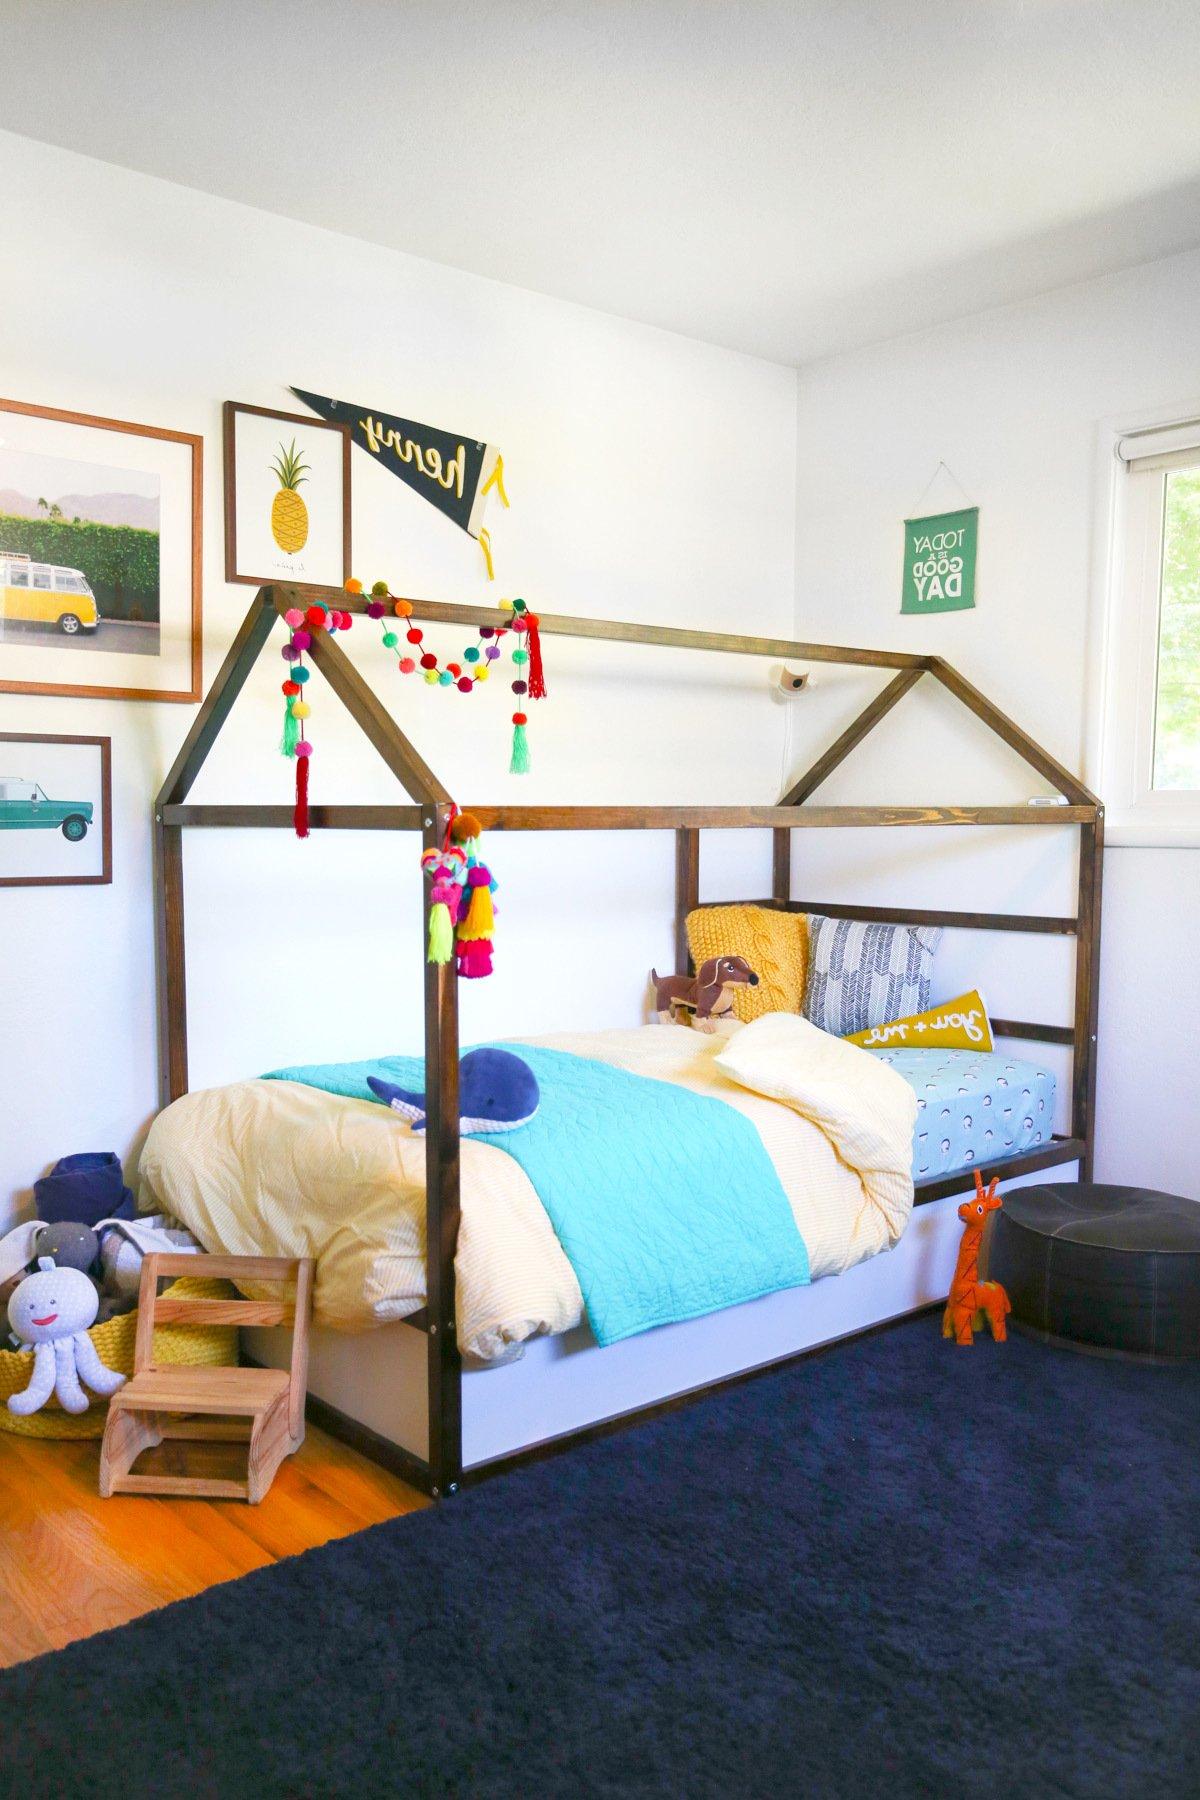 Full Size of Kinderbett Diy Led Lampe Selber Bauen Heimwerker Tutorial Wohnzimmer Kinderbett Diy